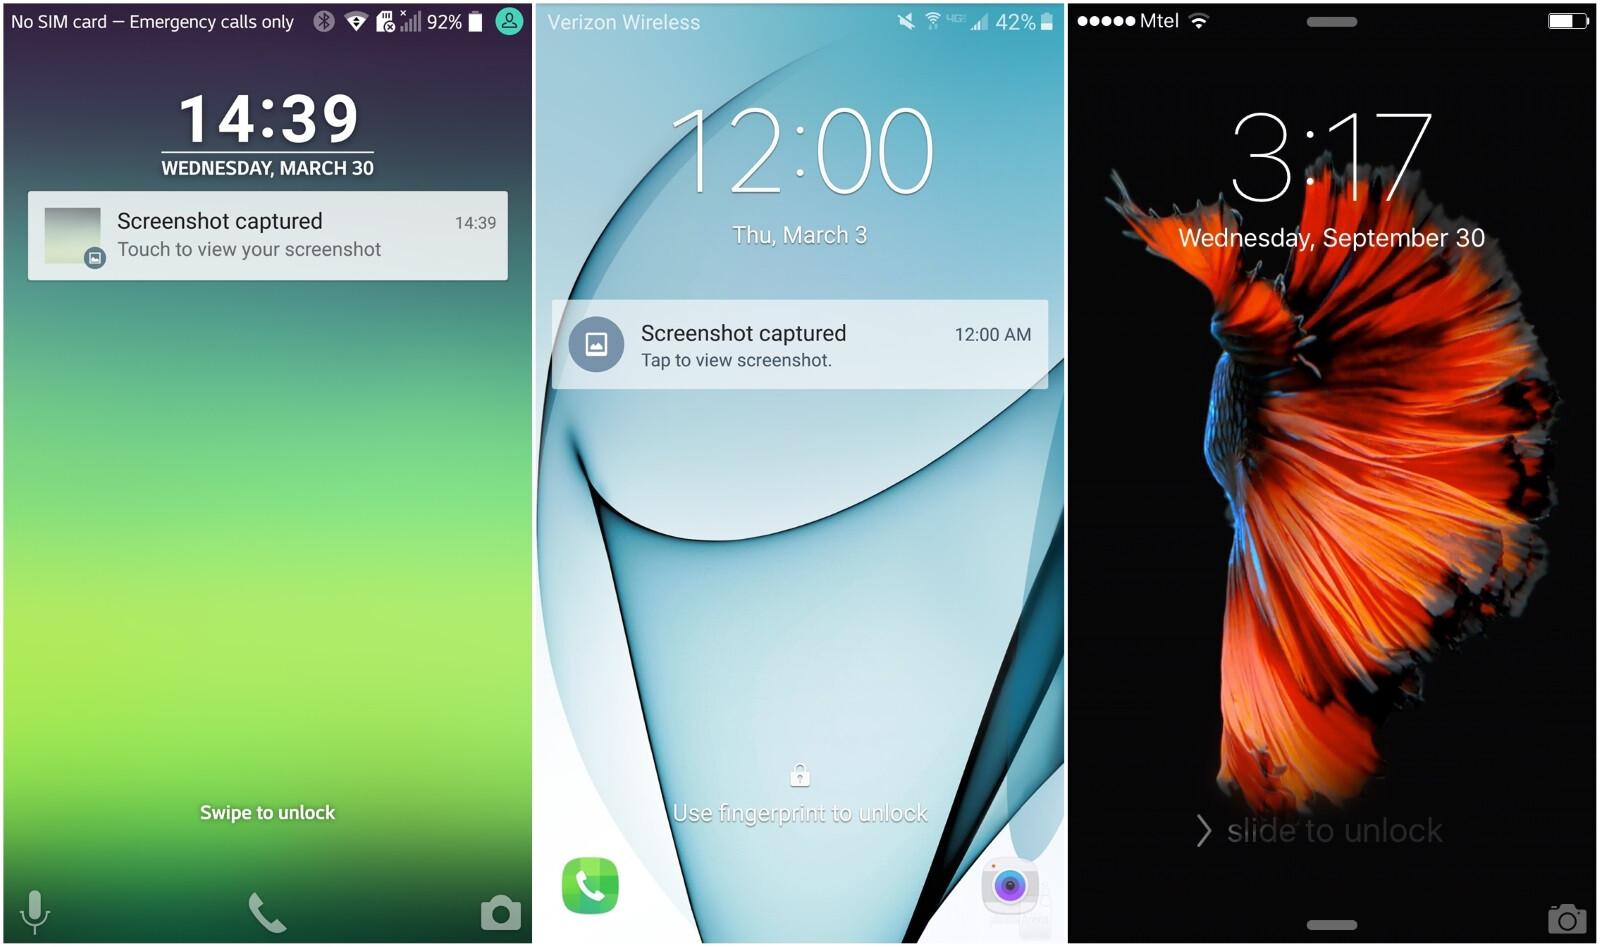 Samsung galaxy s7 vs lg g5 vs apple iphone 6s vs samsung galaxy s6 - Lg G5 Lg Ux Vs Samsung Galaxy S7 Touchwiz Vs Apple Iphone 6s Ios 9 Lockscreens